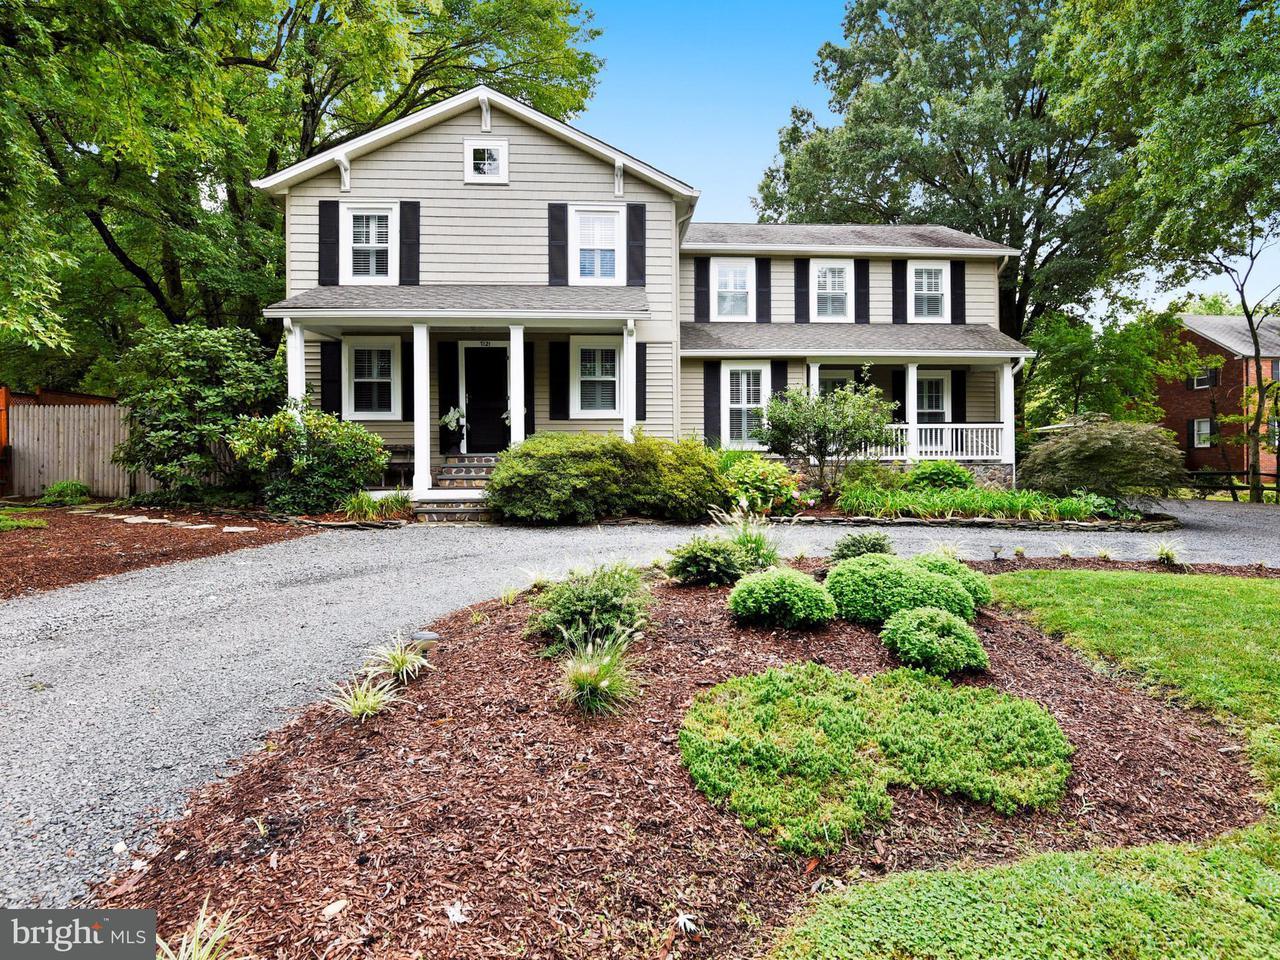 Single Family Home for Sale at 7121 HARRISON Lane 7121 HARRISON Lane Alexandria, Virginia 22306 United States